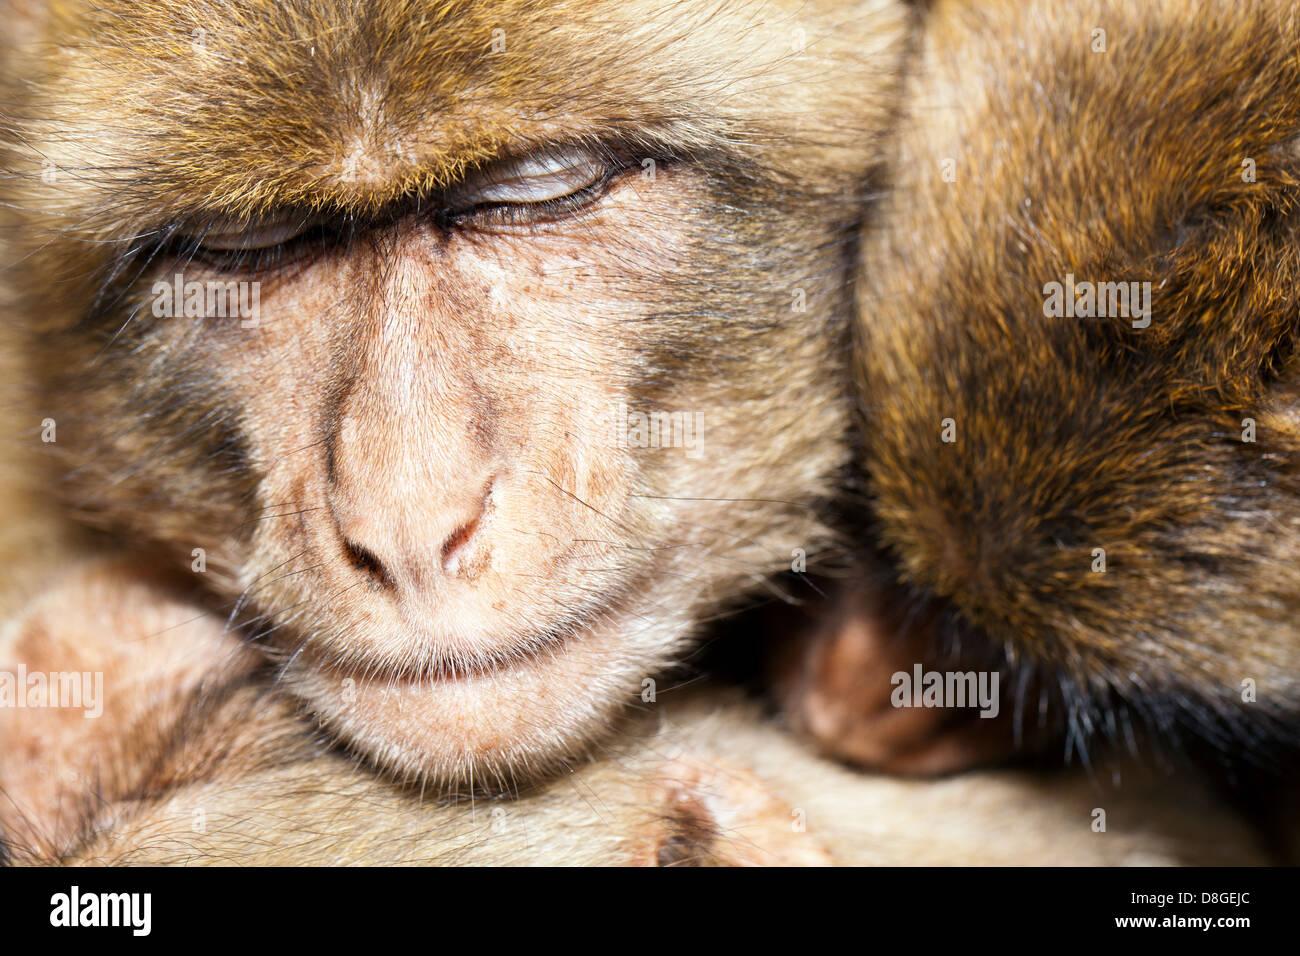 Three monkeys sharing a group hug as they snuggle and sleep together.  Barbary Macaque (Macaca sylvanus), an endangered - Stock Image